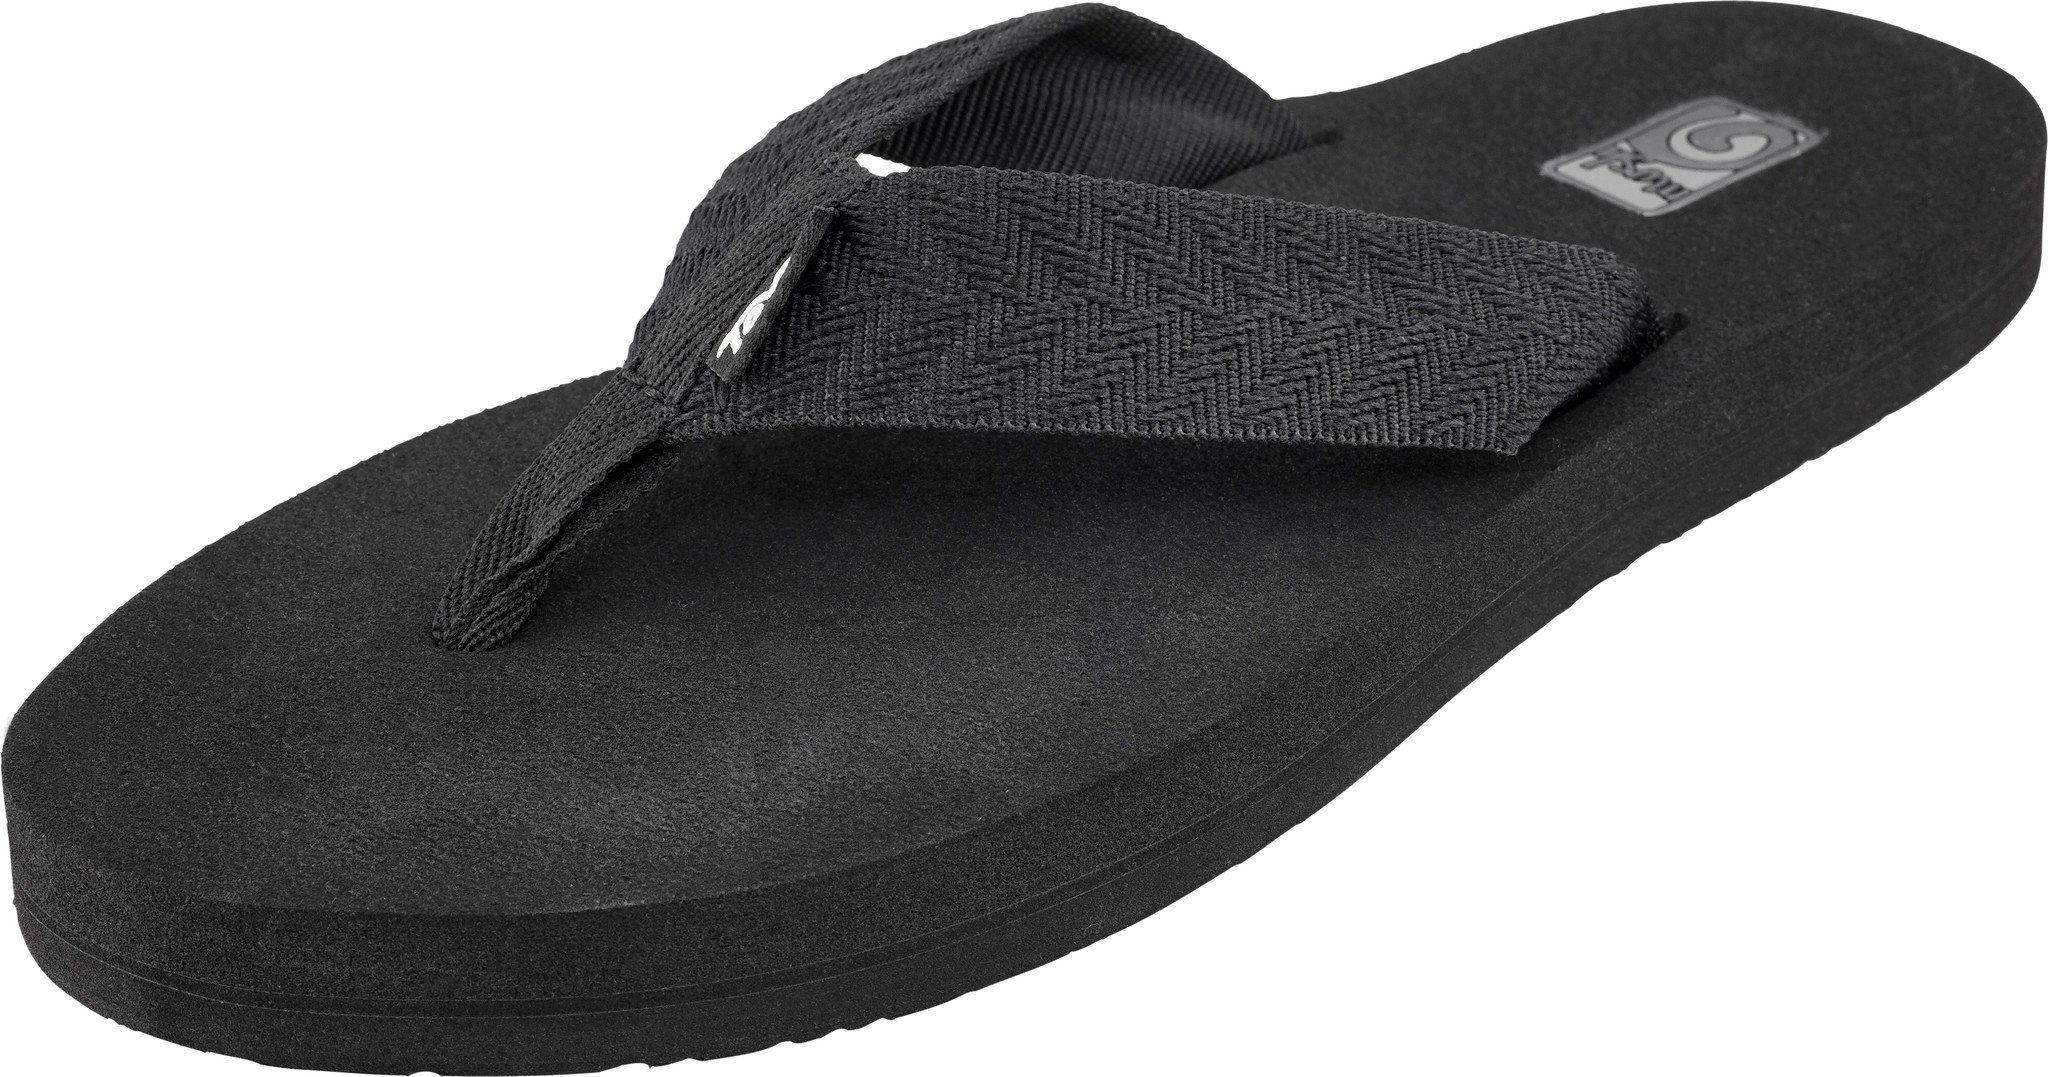 Teva Sandale »Mush 2 Sandals Women Fronds Black«